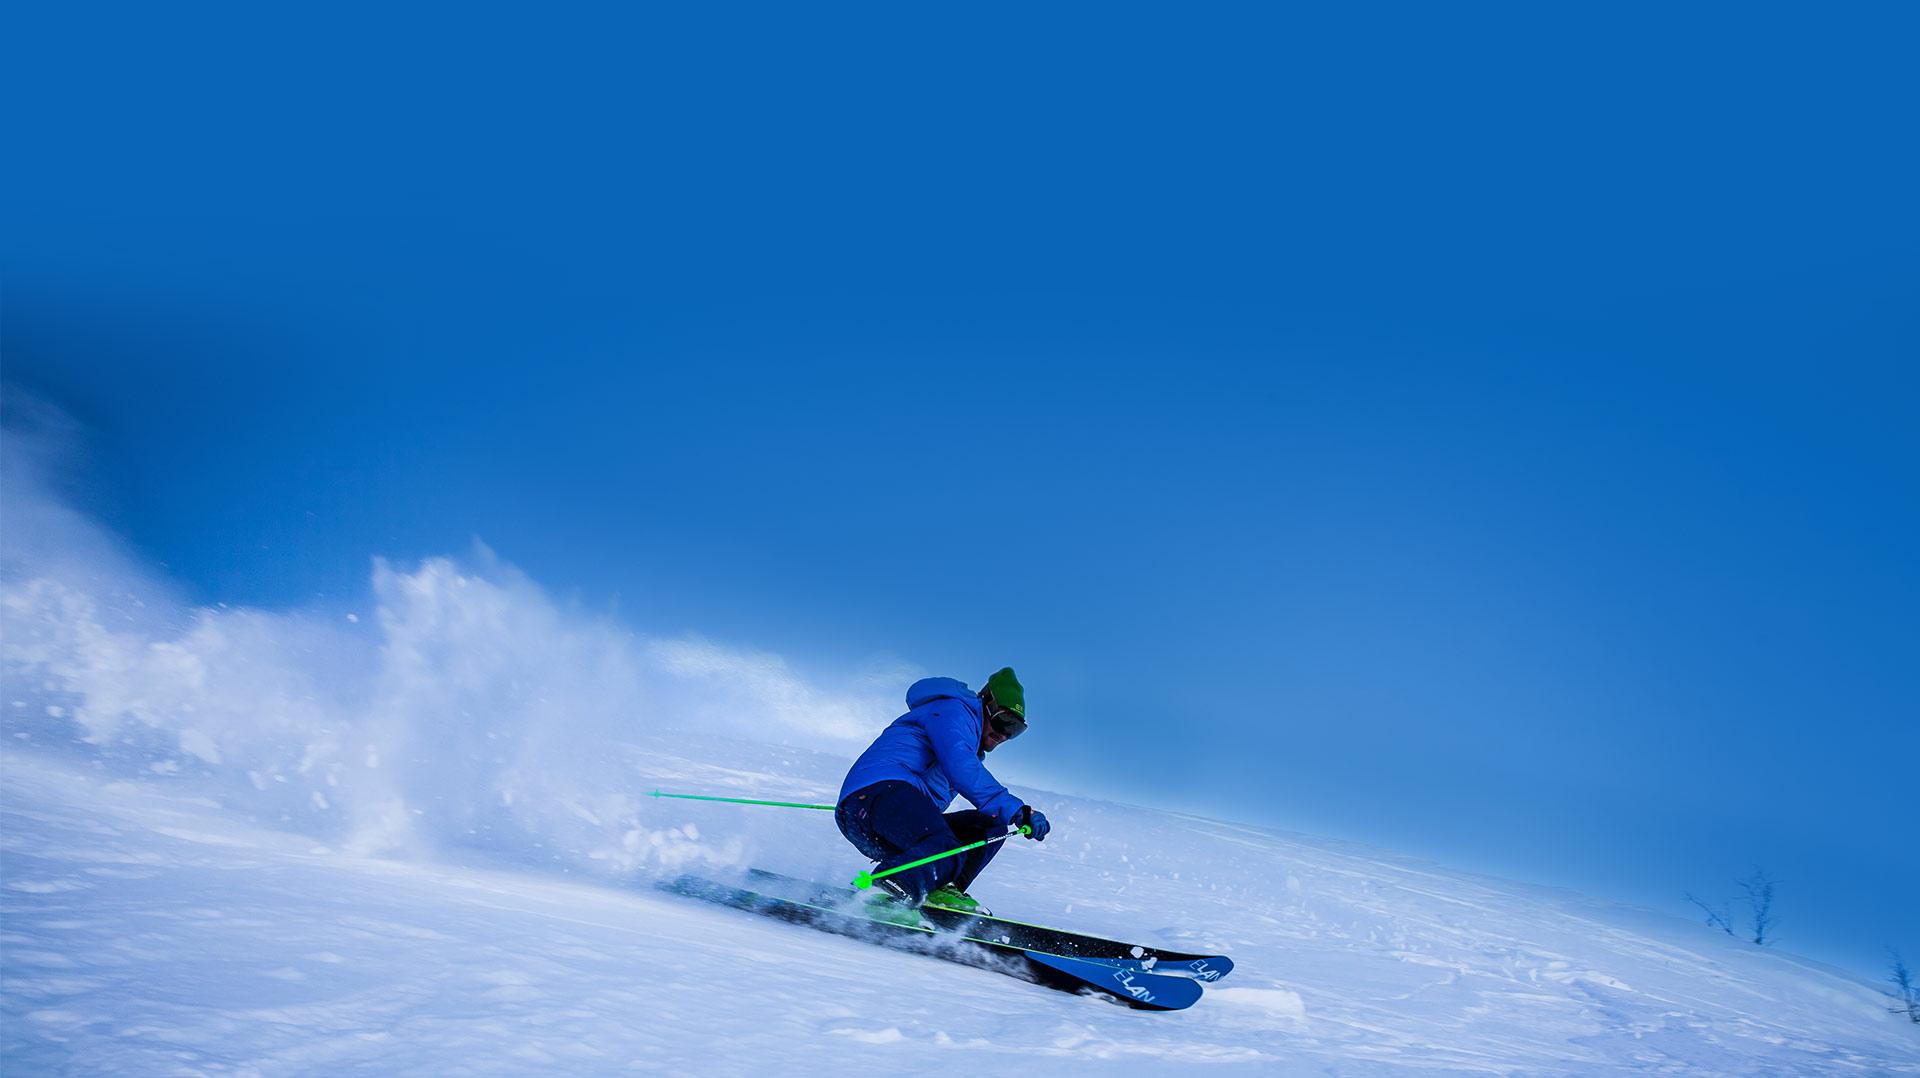 downhill skiier snow